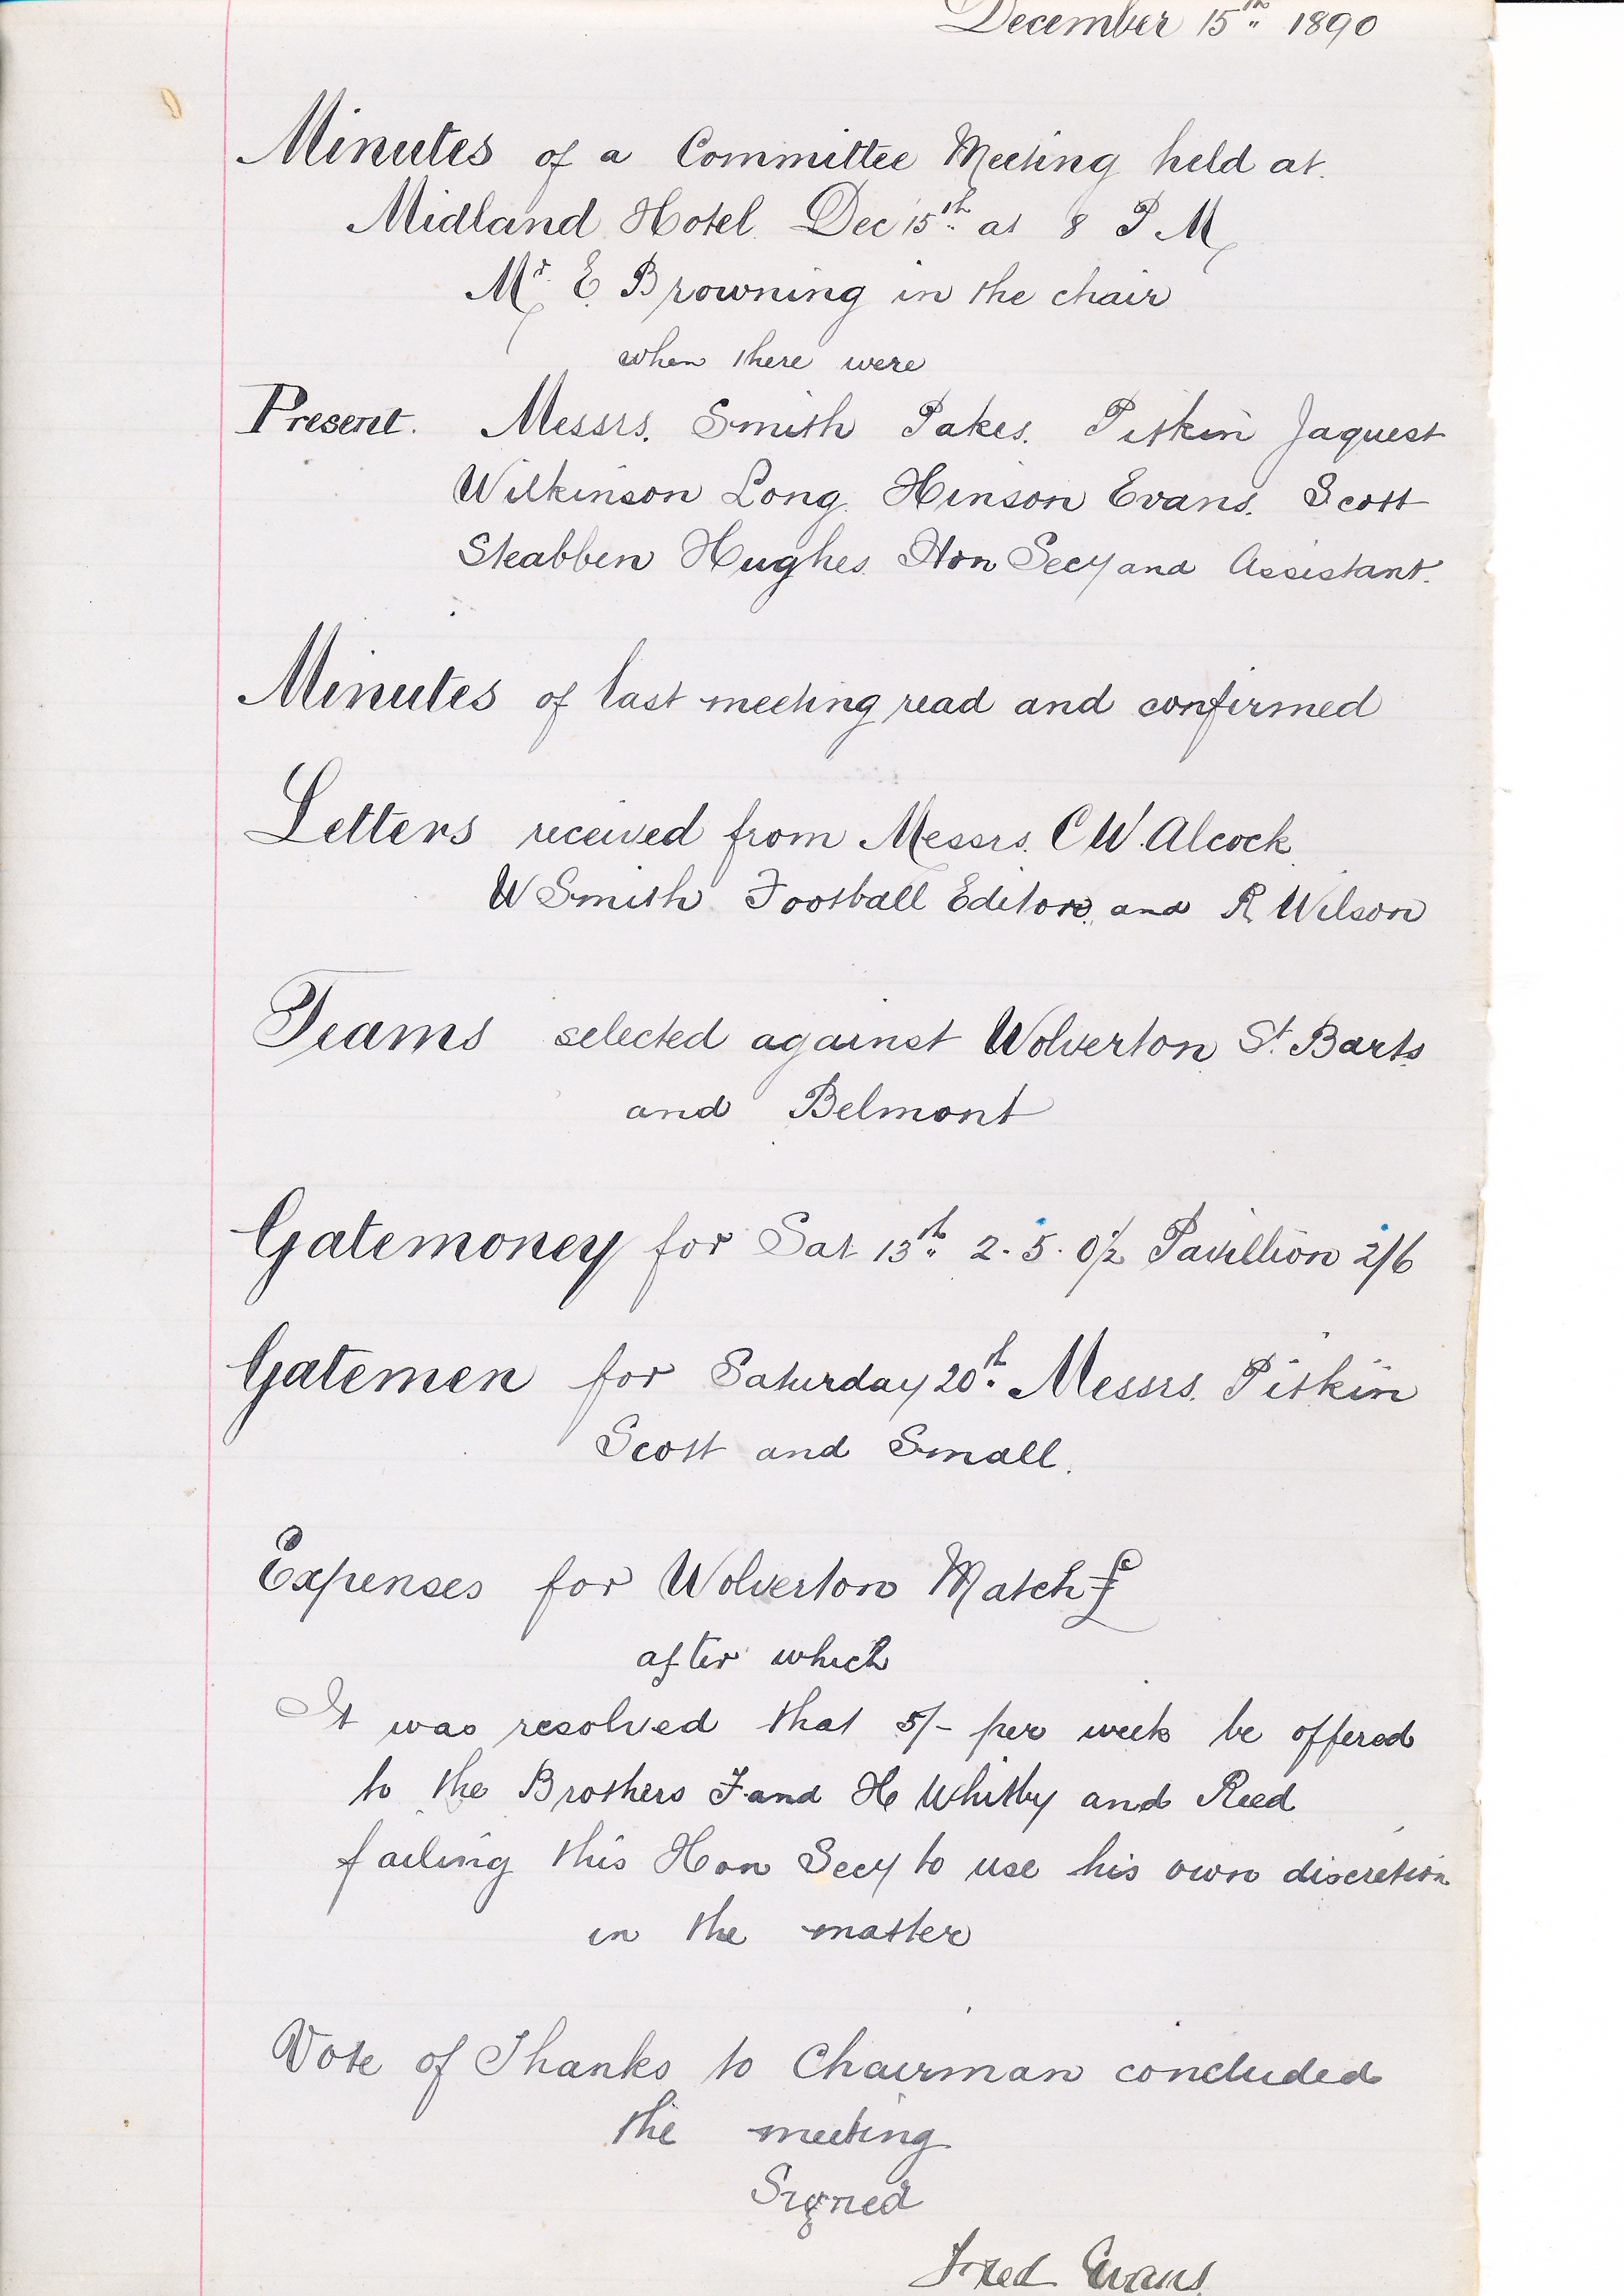 ltfc-minute-book-15th-december-1890